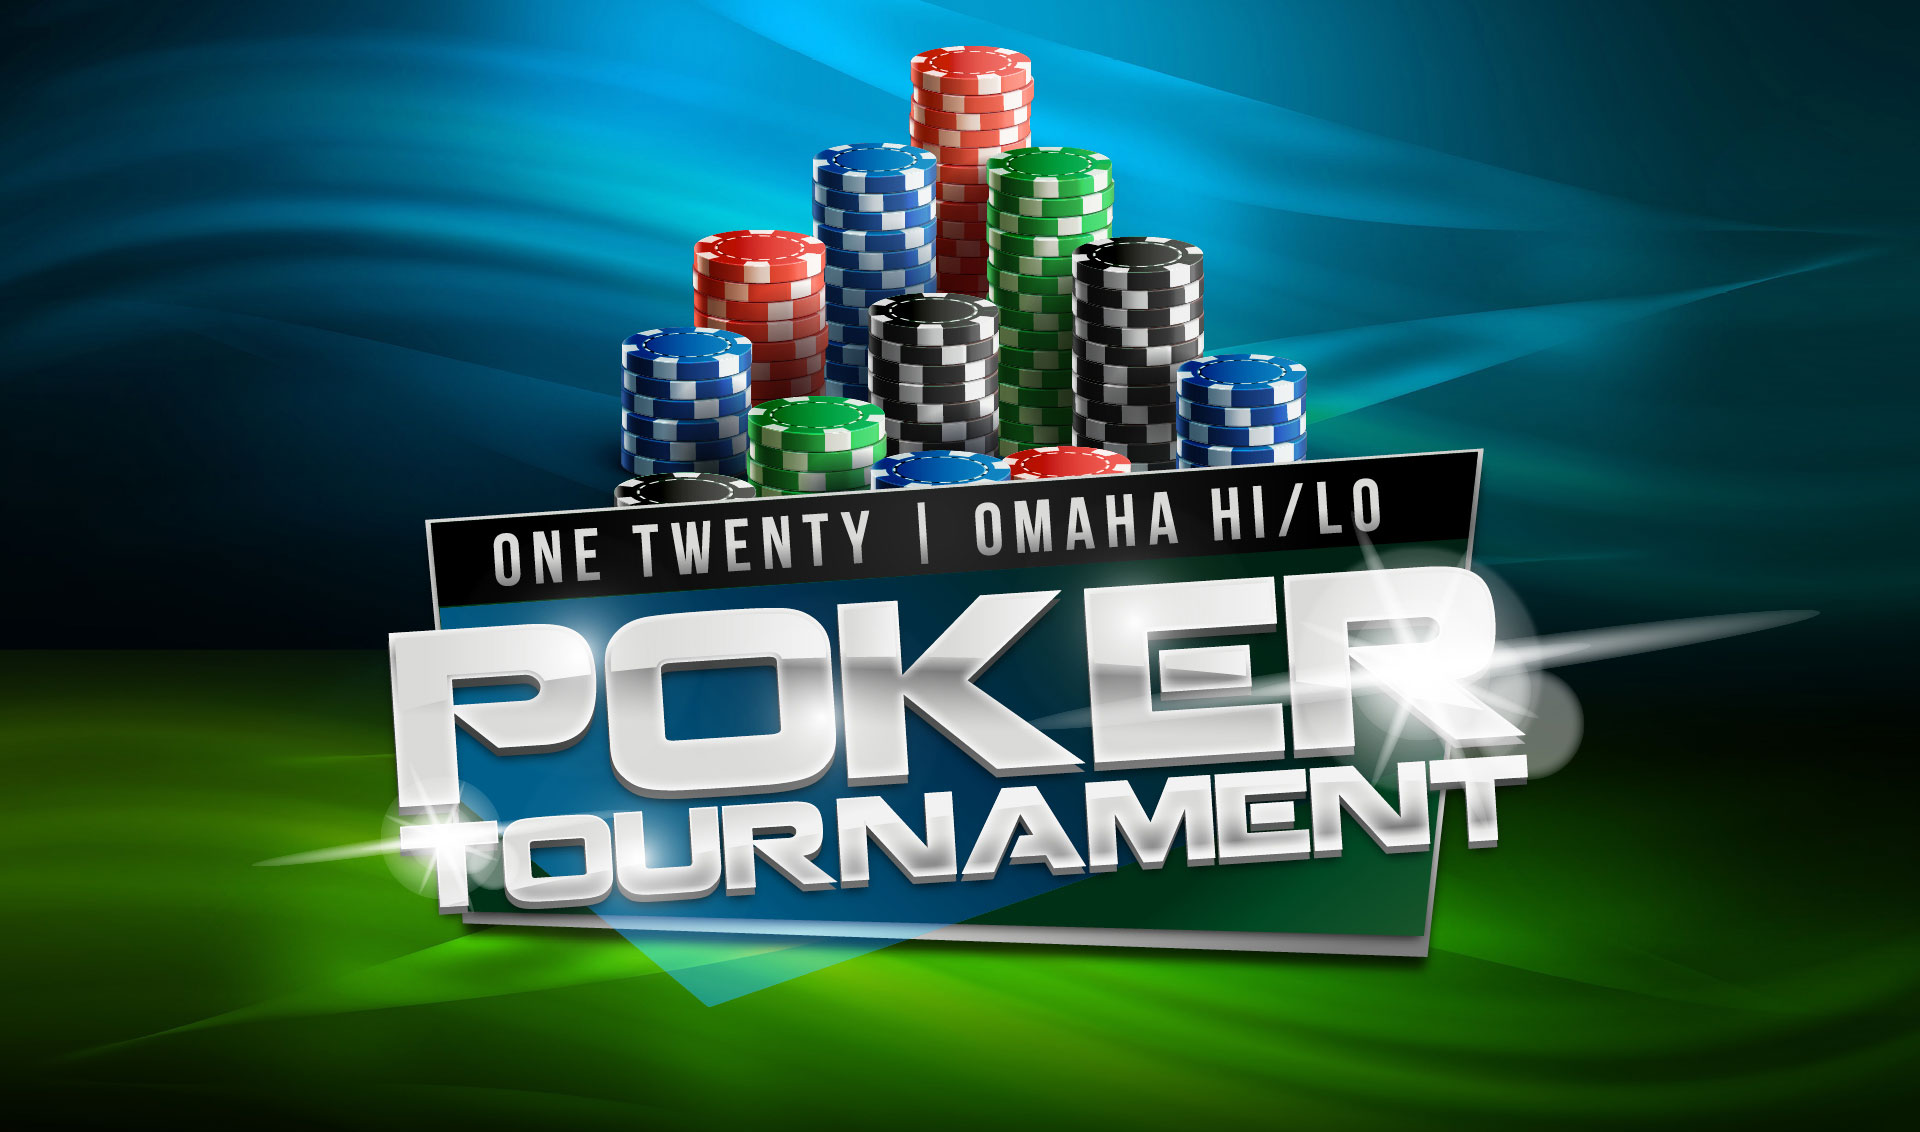 One Twenty Omaha Poker Tournament